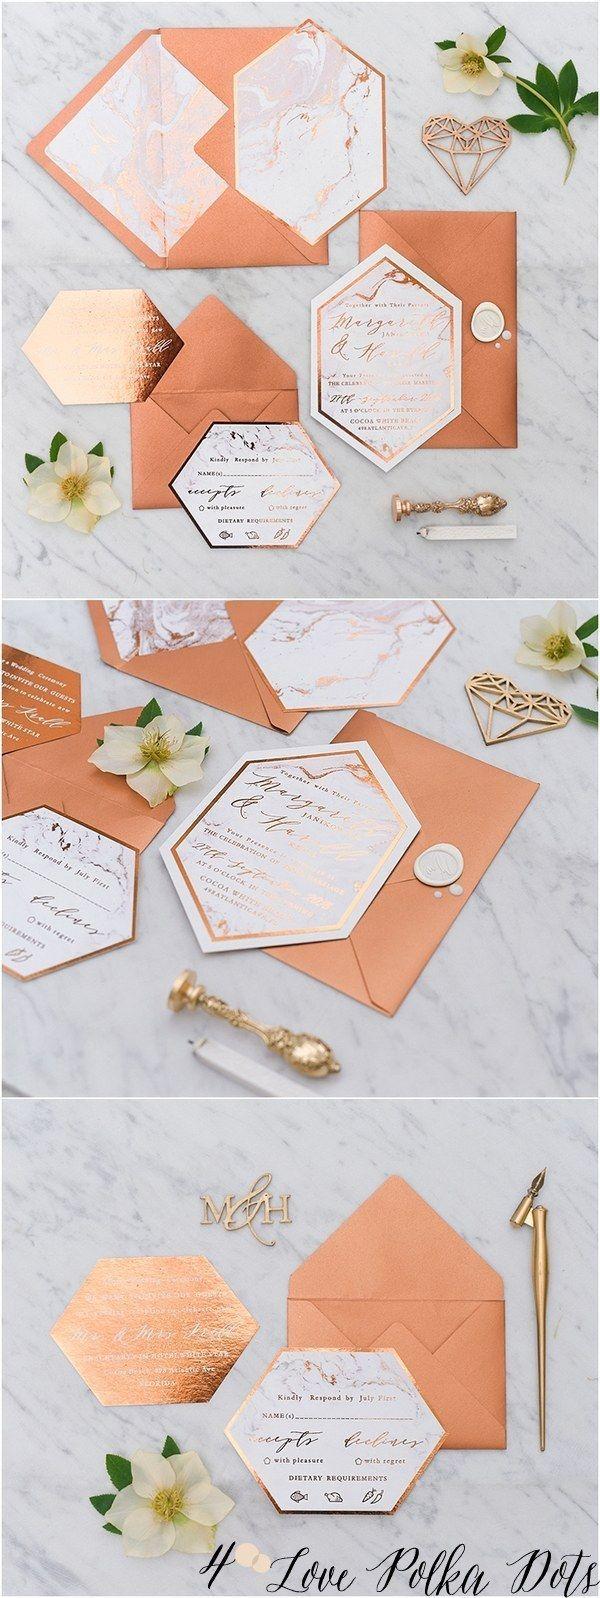 The 25+ best Wedding acceptance card ideas on Pinterest | Words ...